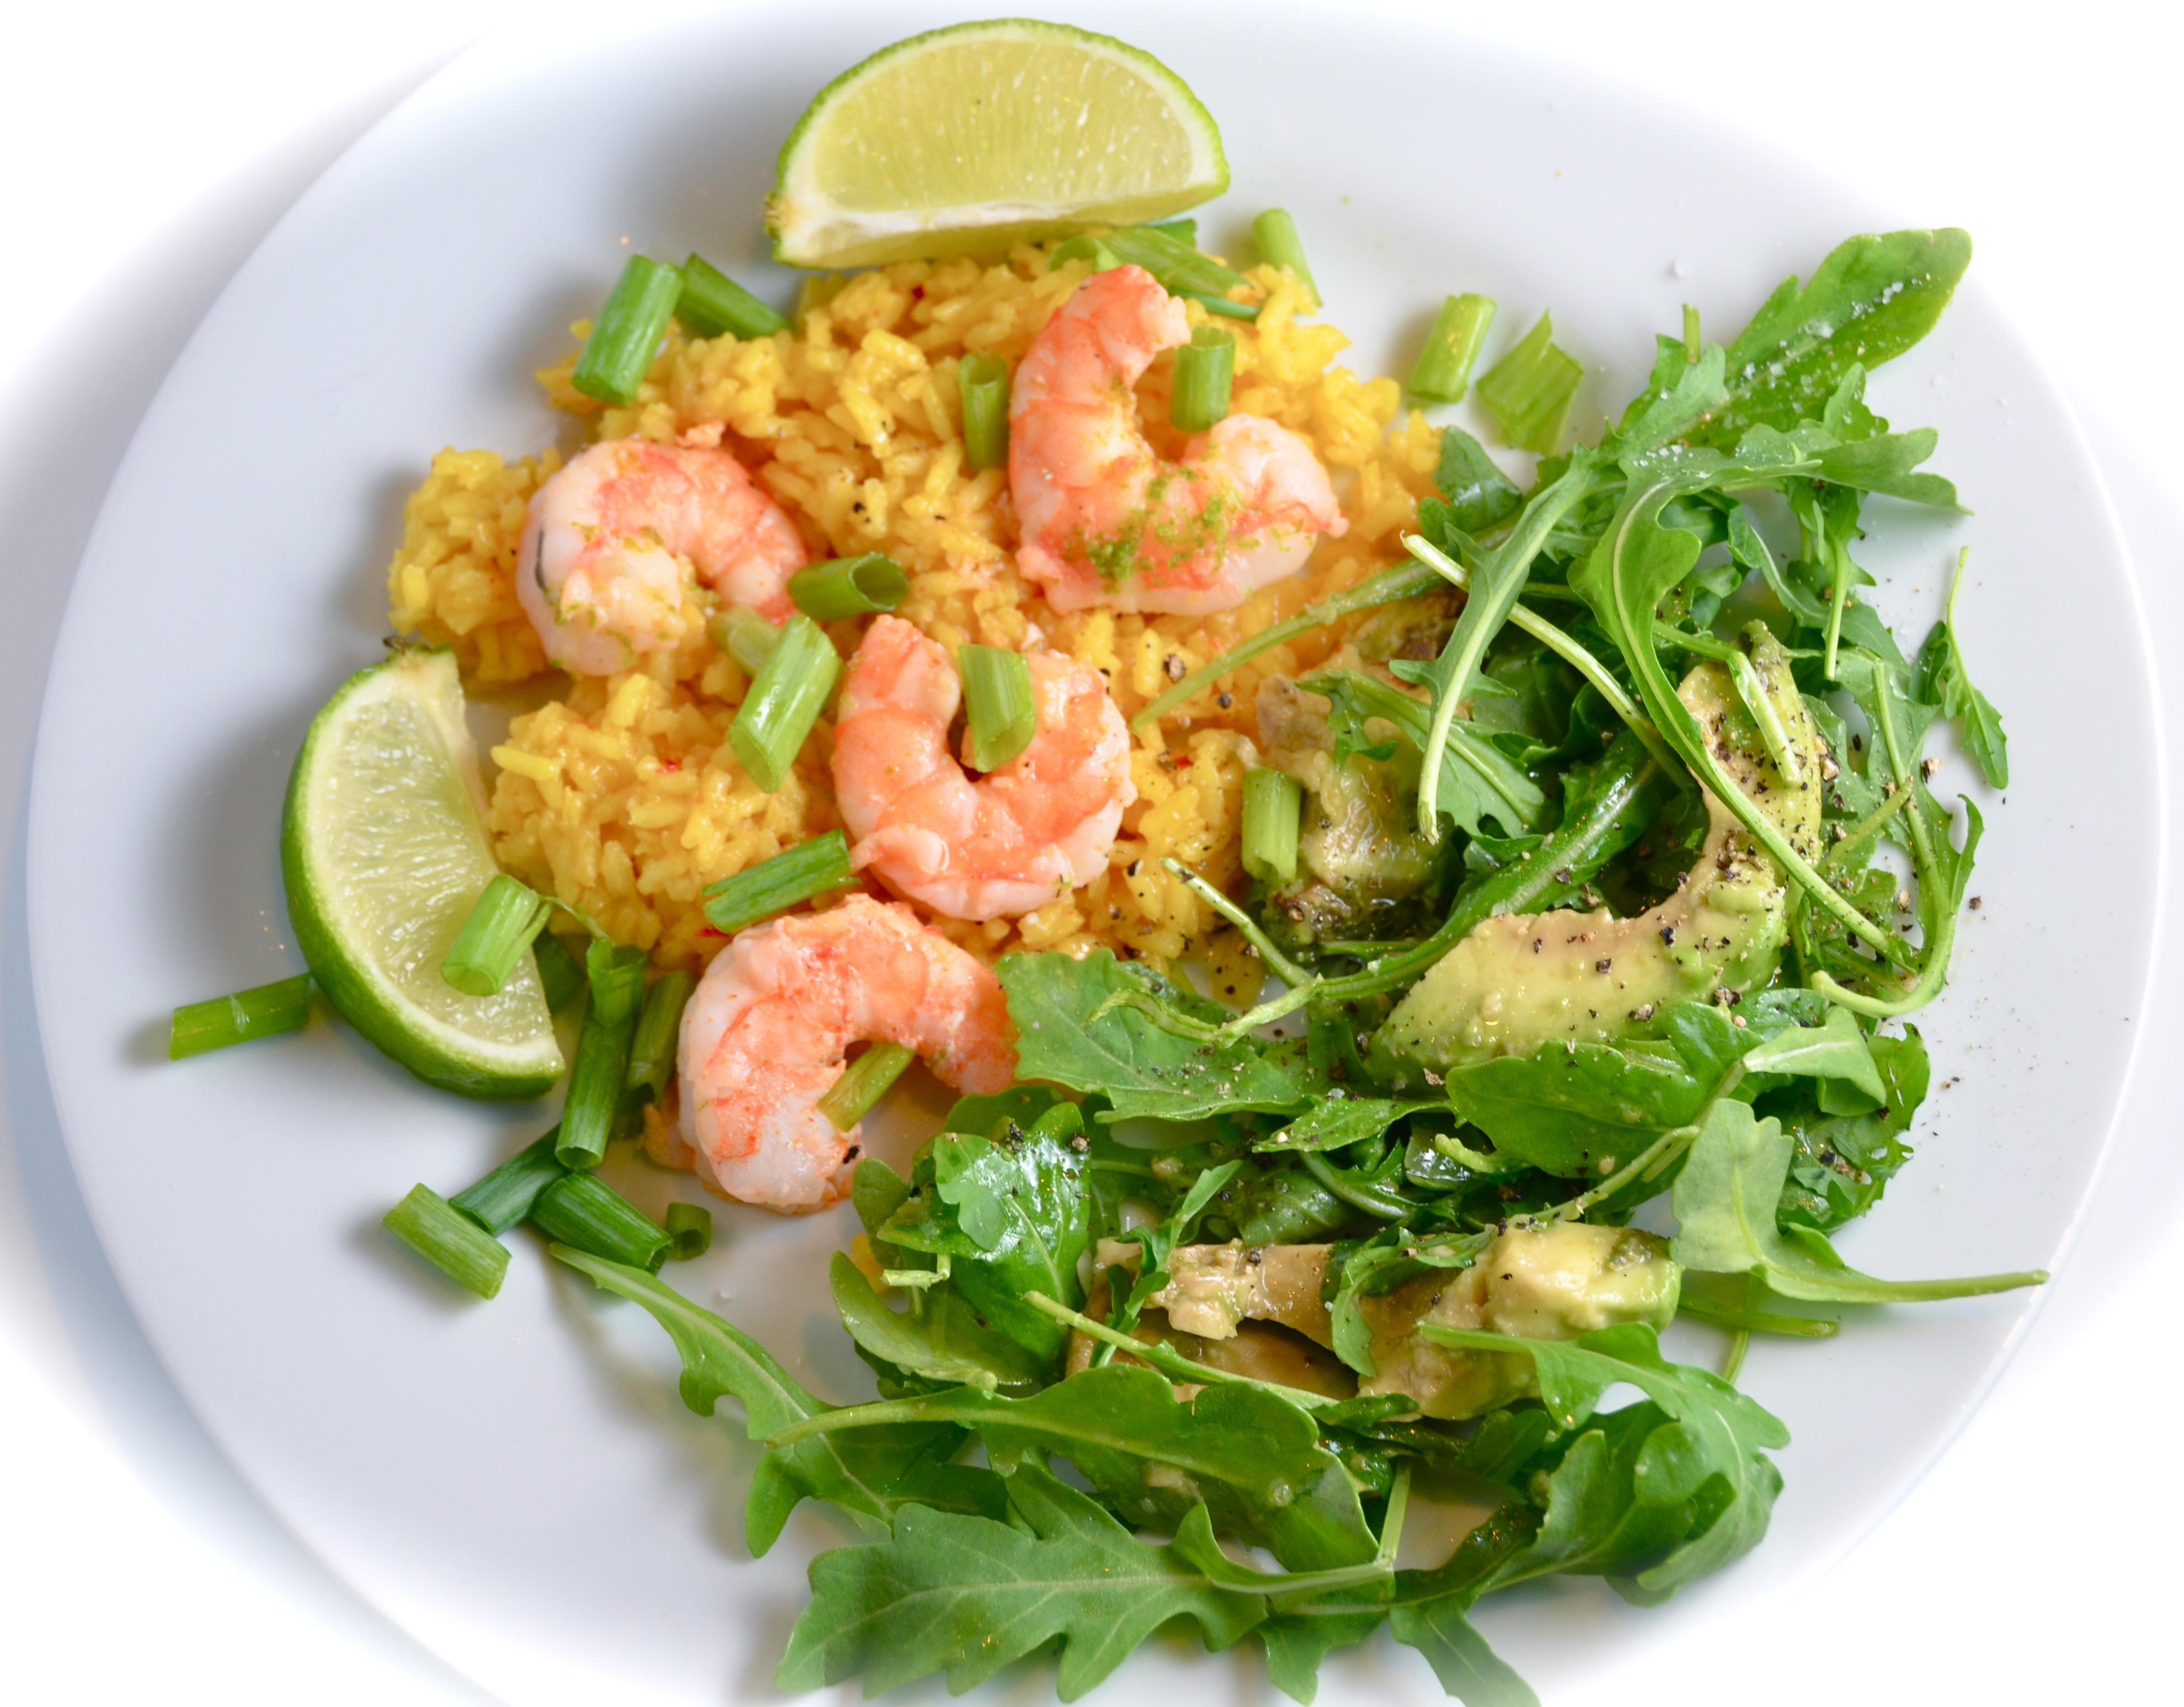 Spicy Shrimp With Avocado And Arugula Salad Recipes — Dishmaps